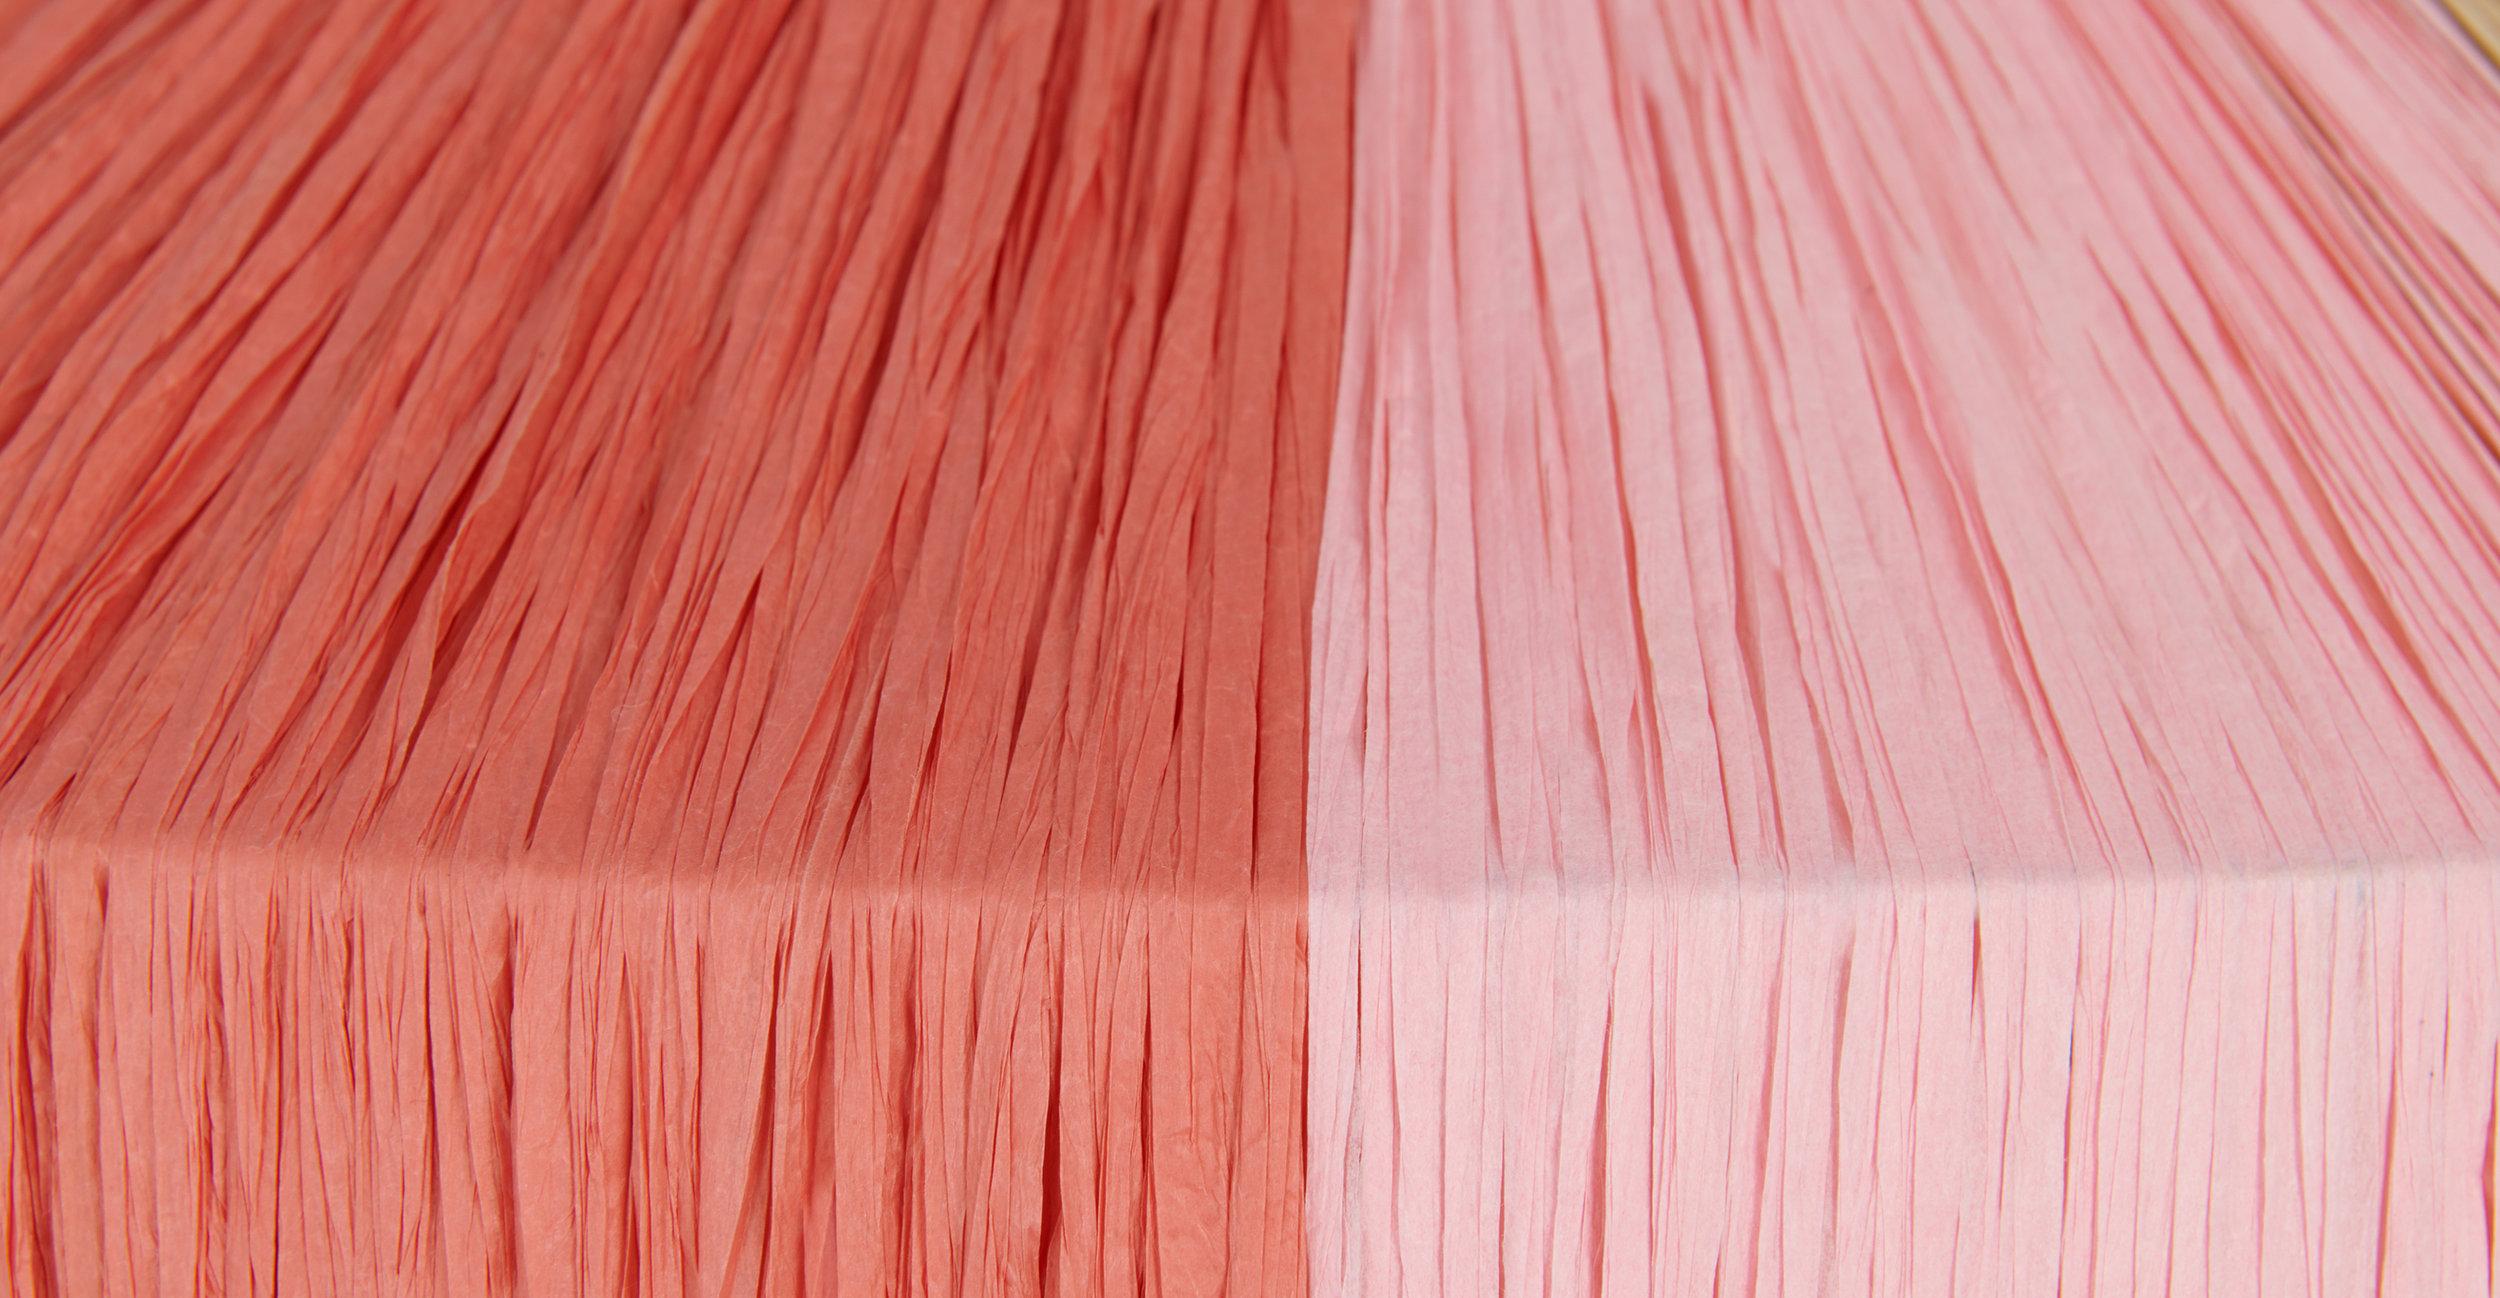 CLPDIE002PNK-UK_Diego_Pendant_Shade_Tonal_Pink_Natural_LB05.jpg